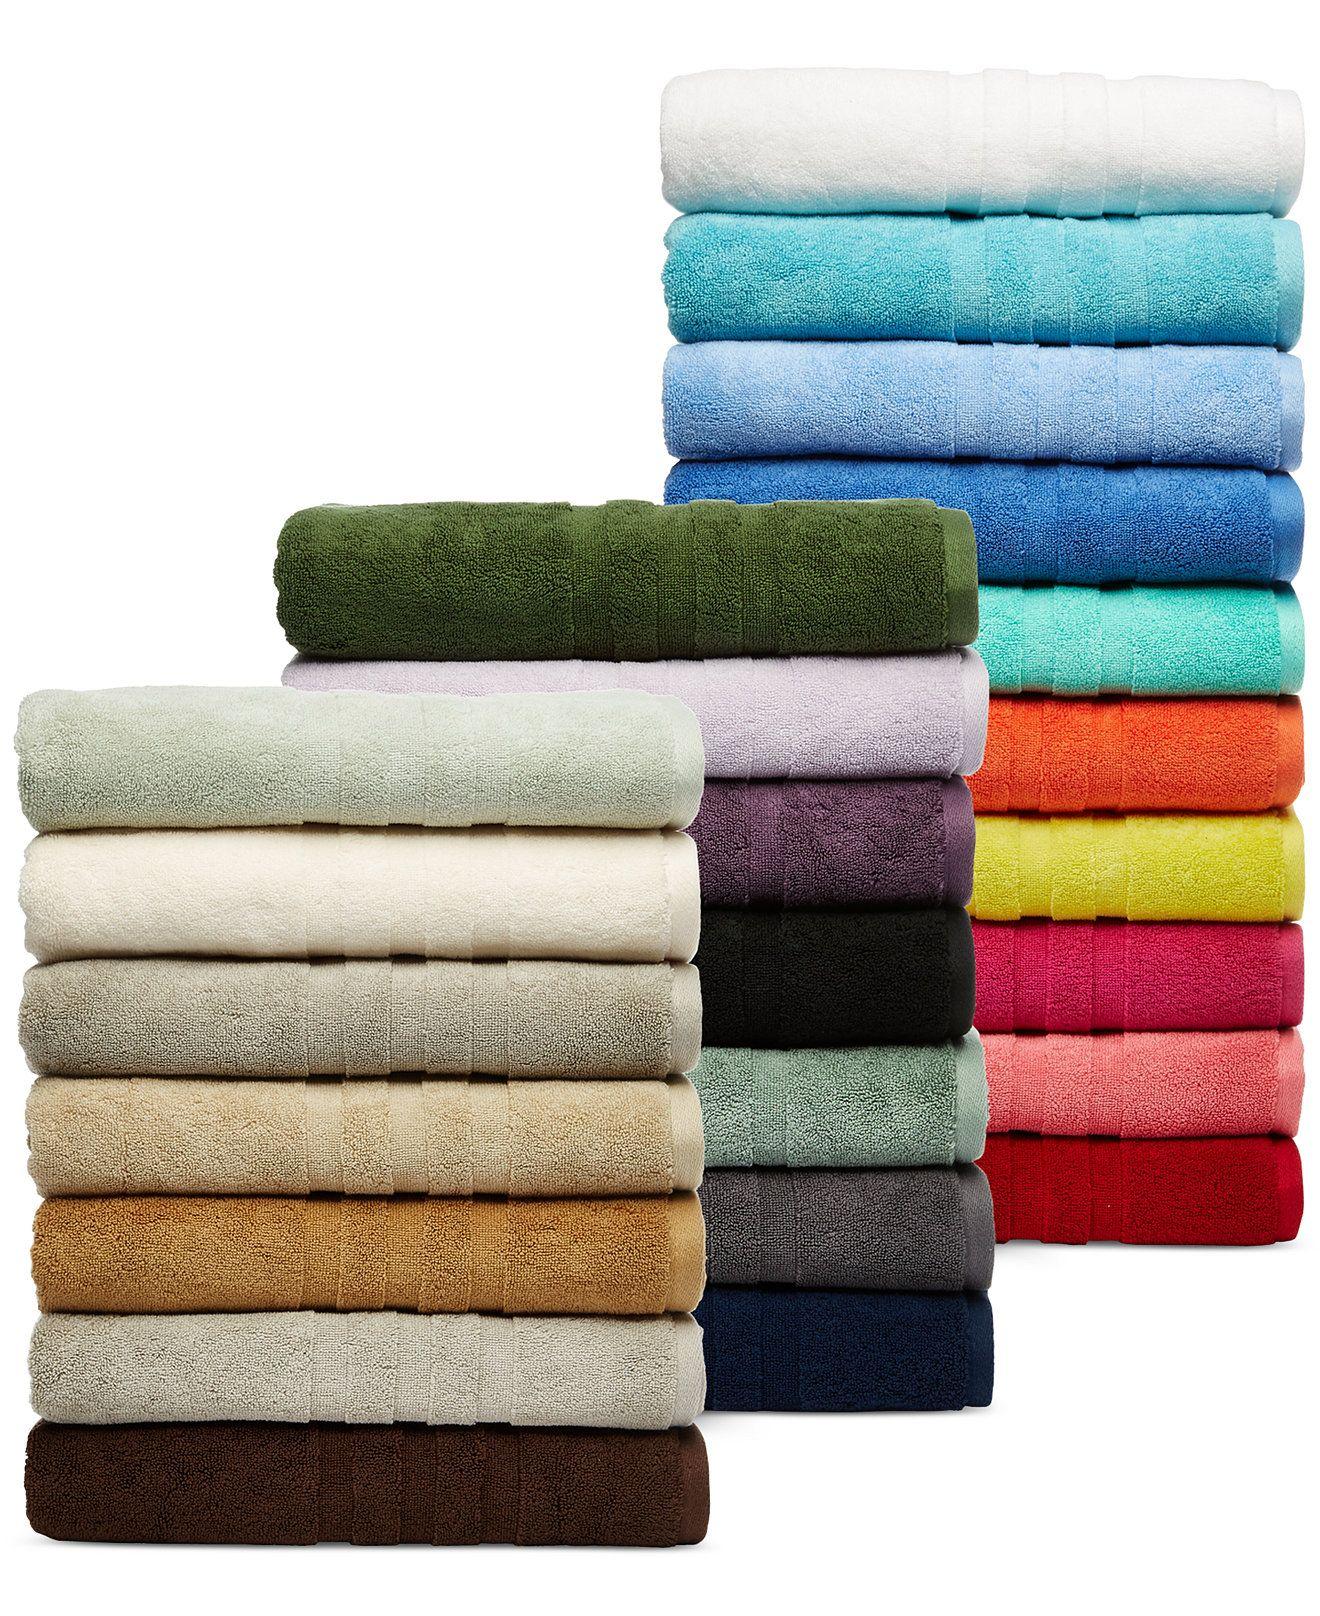 0f7e4d0a25 Ralph Lauren Palmer Bath Towel Collection - Bath Towels - Bed   Bath -  Macy s